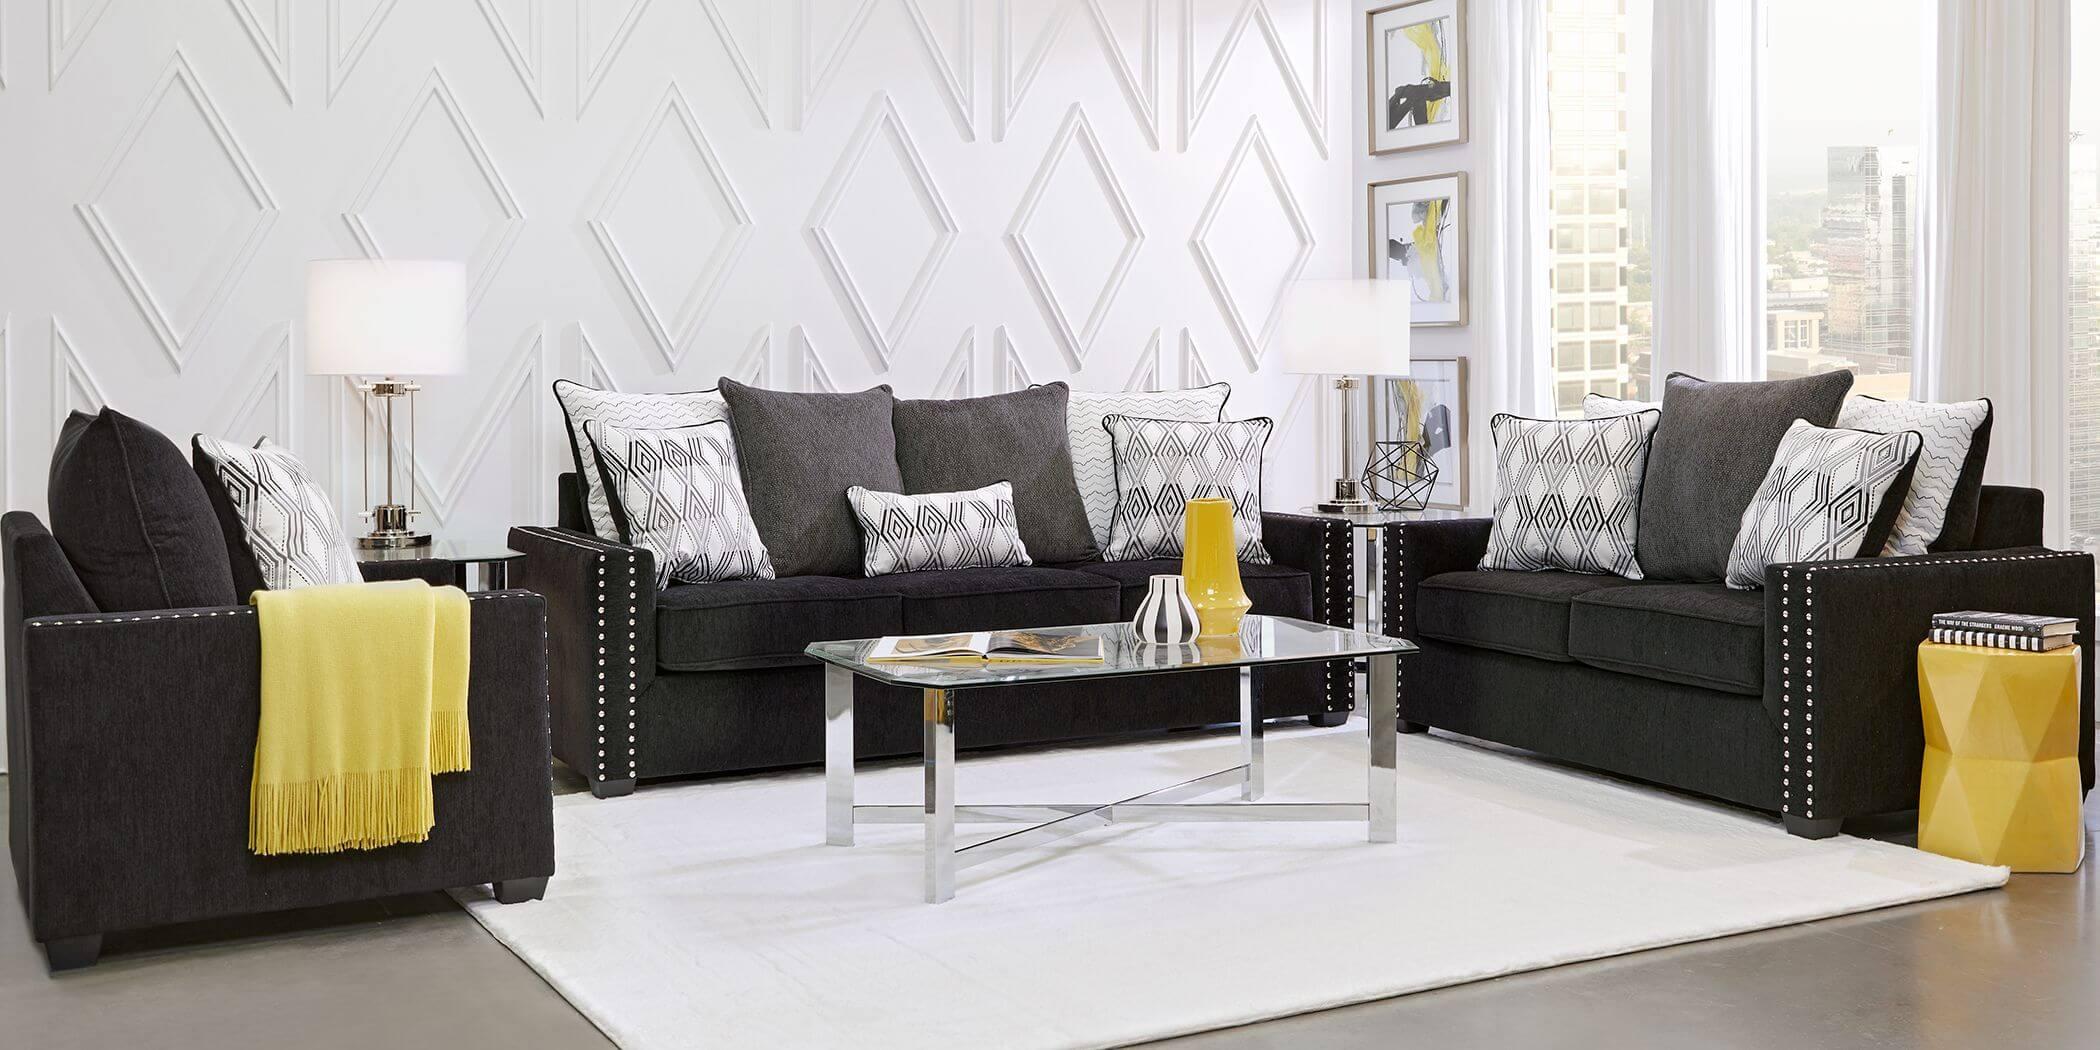 2095 vogue ebony living roomdiscontinued • urban